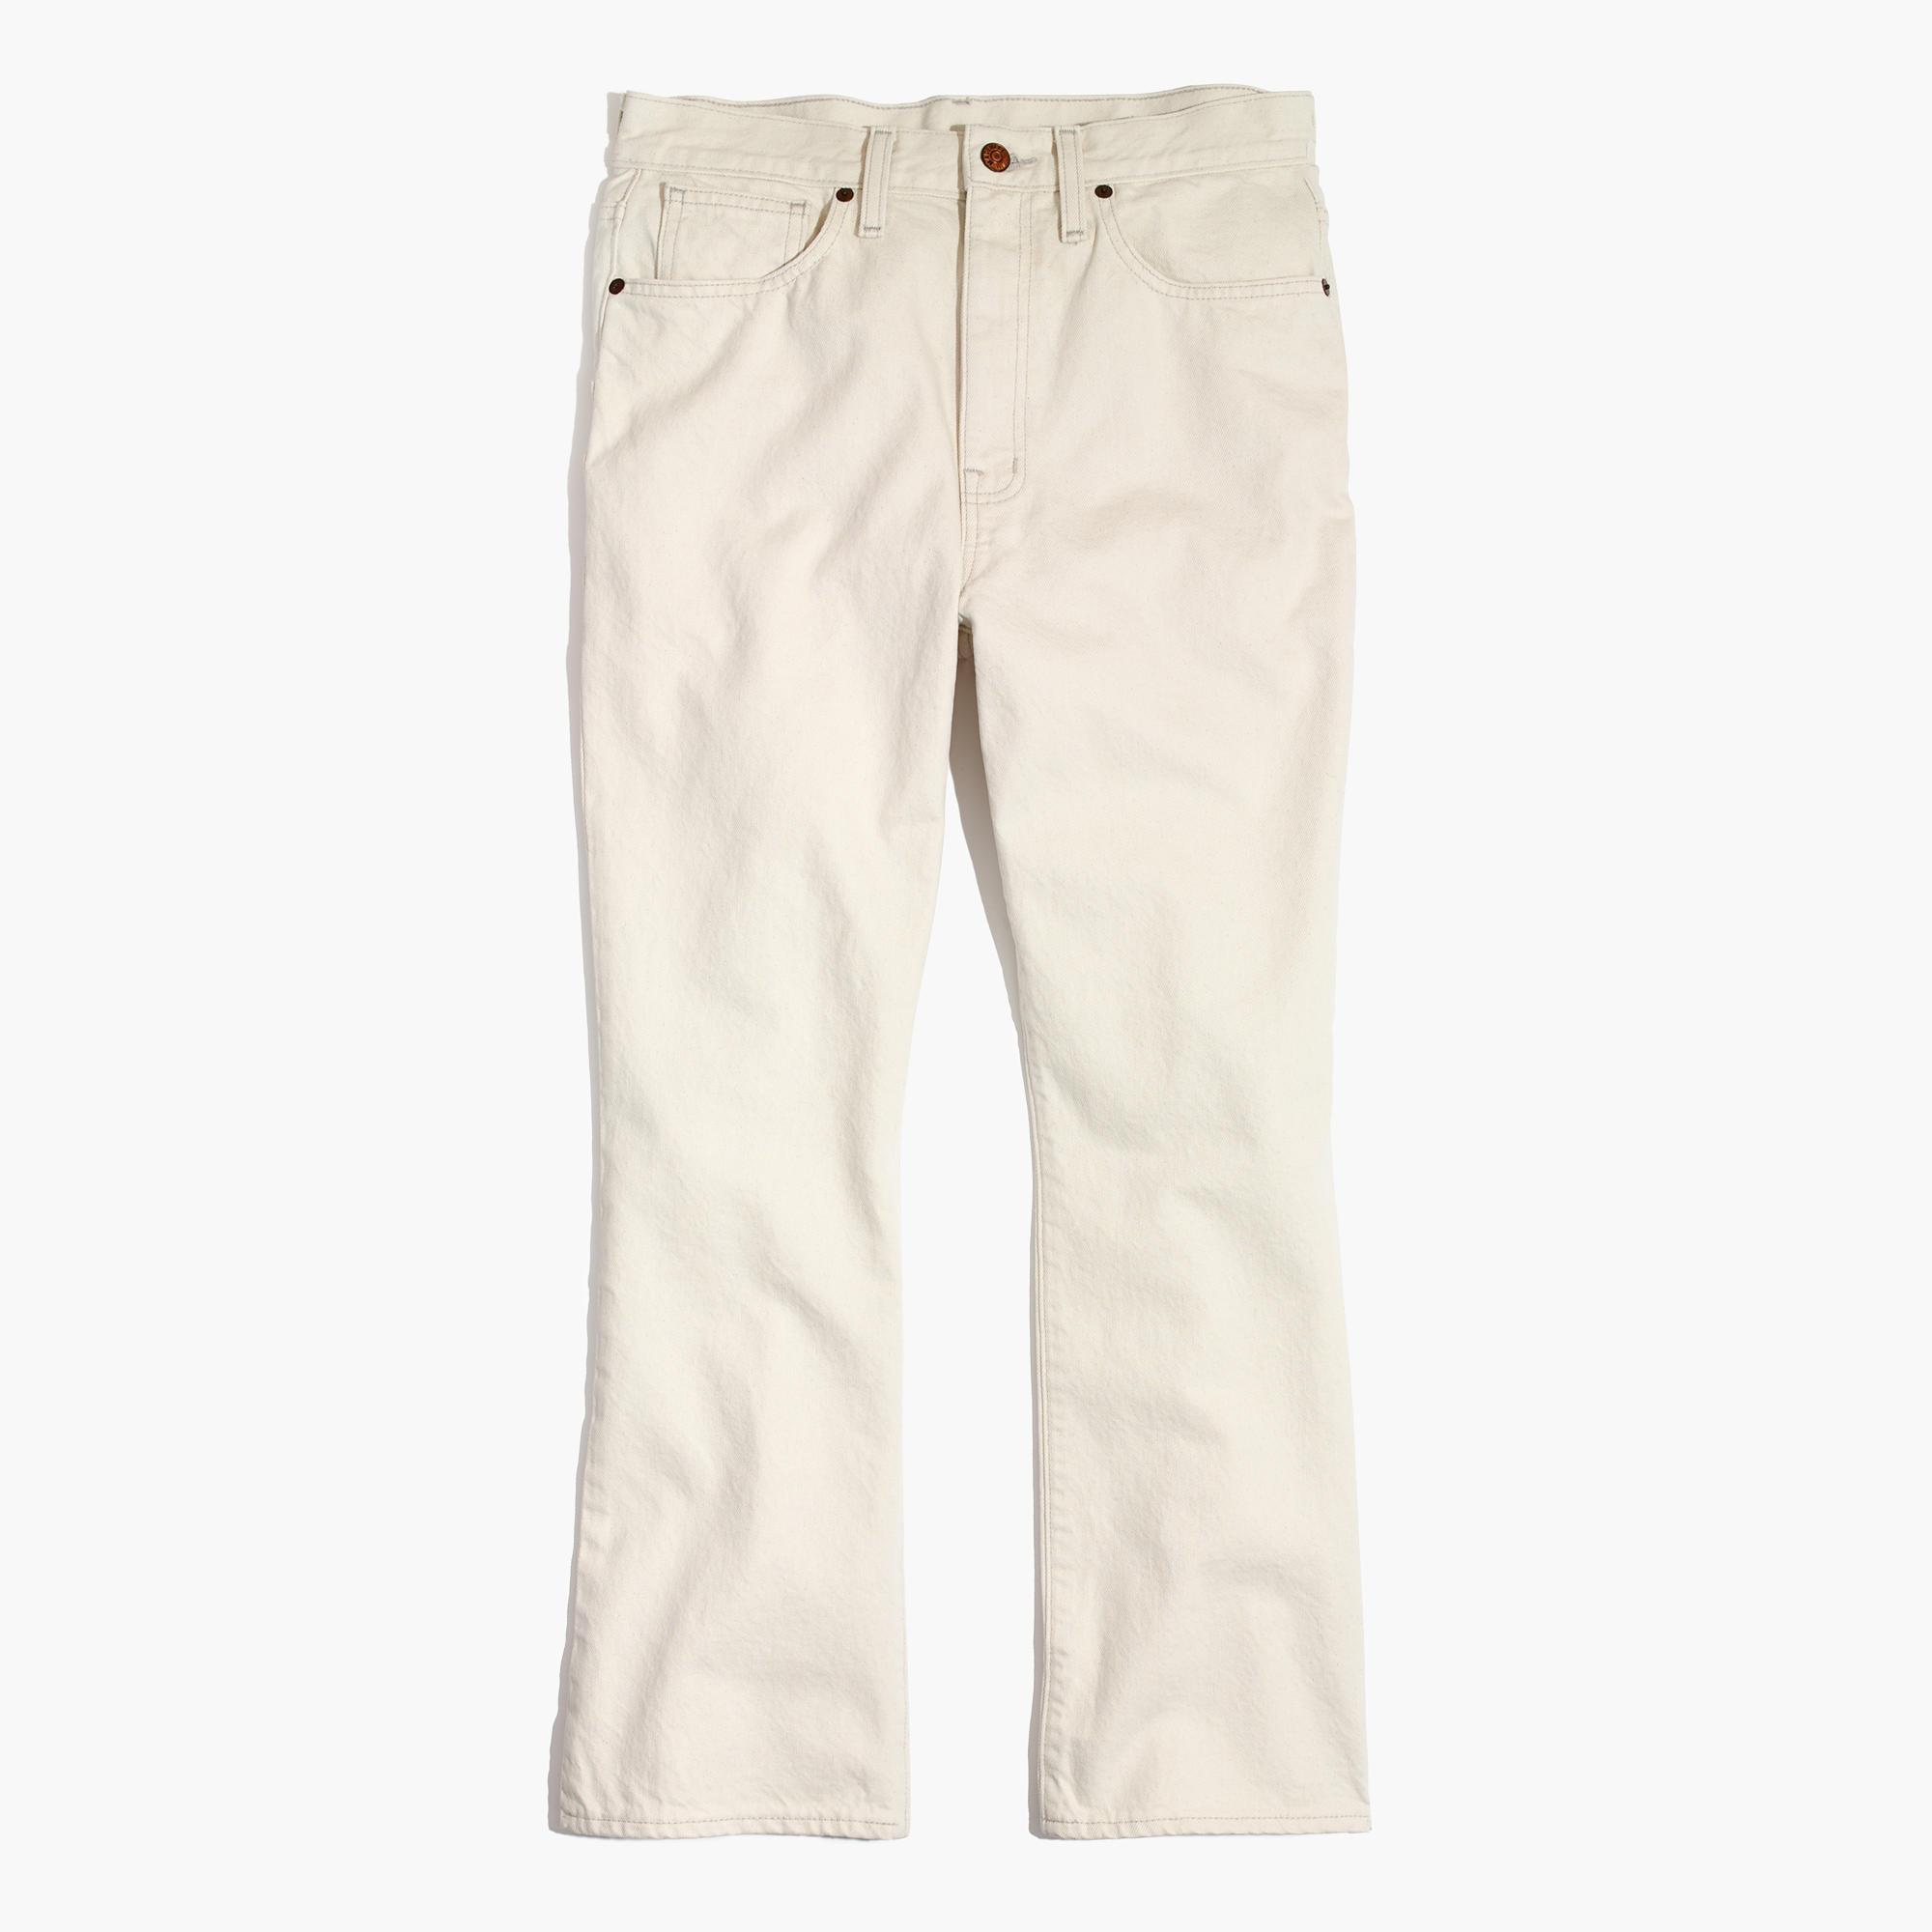 Retro Crop Bootcut Jeans